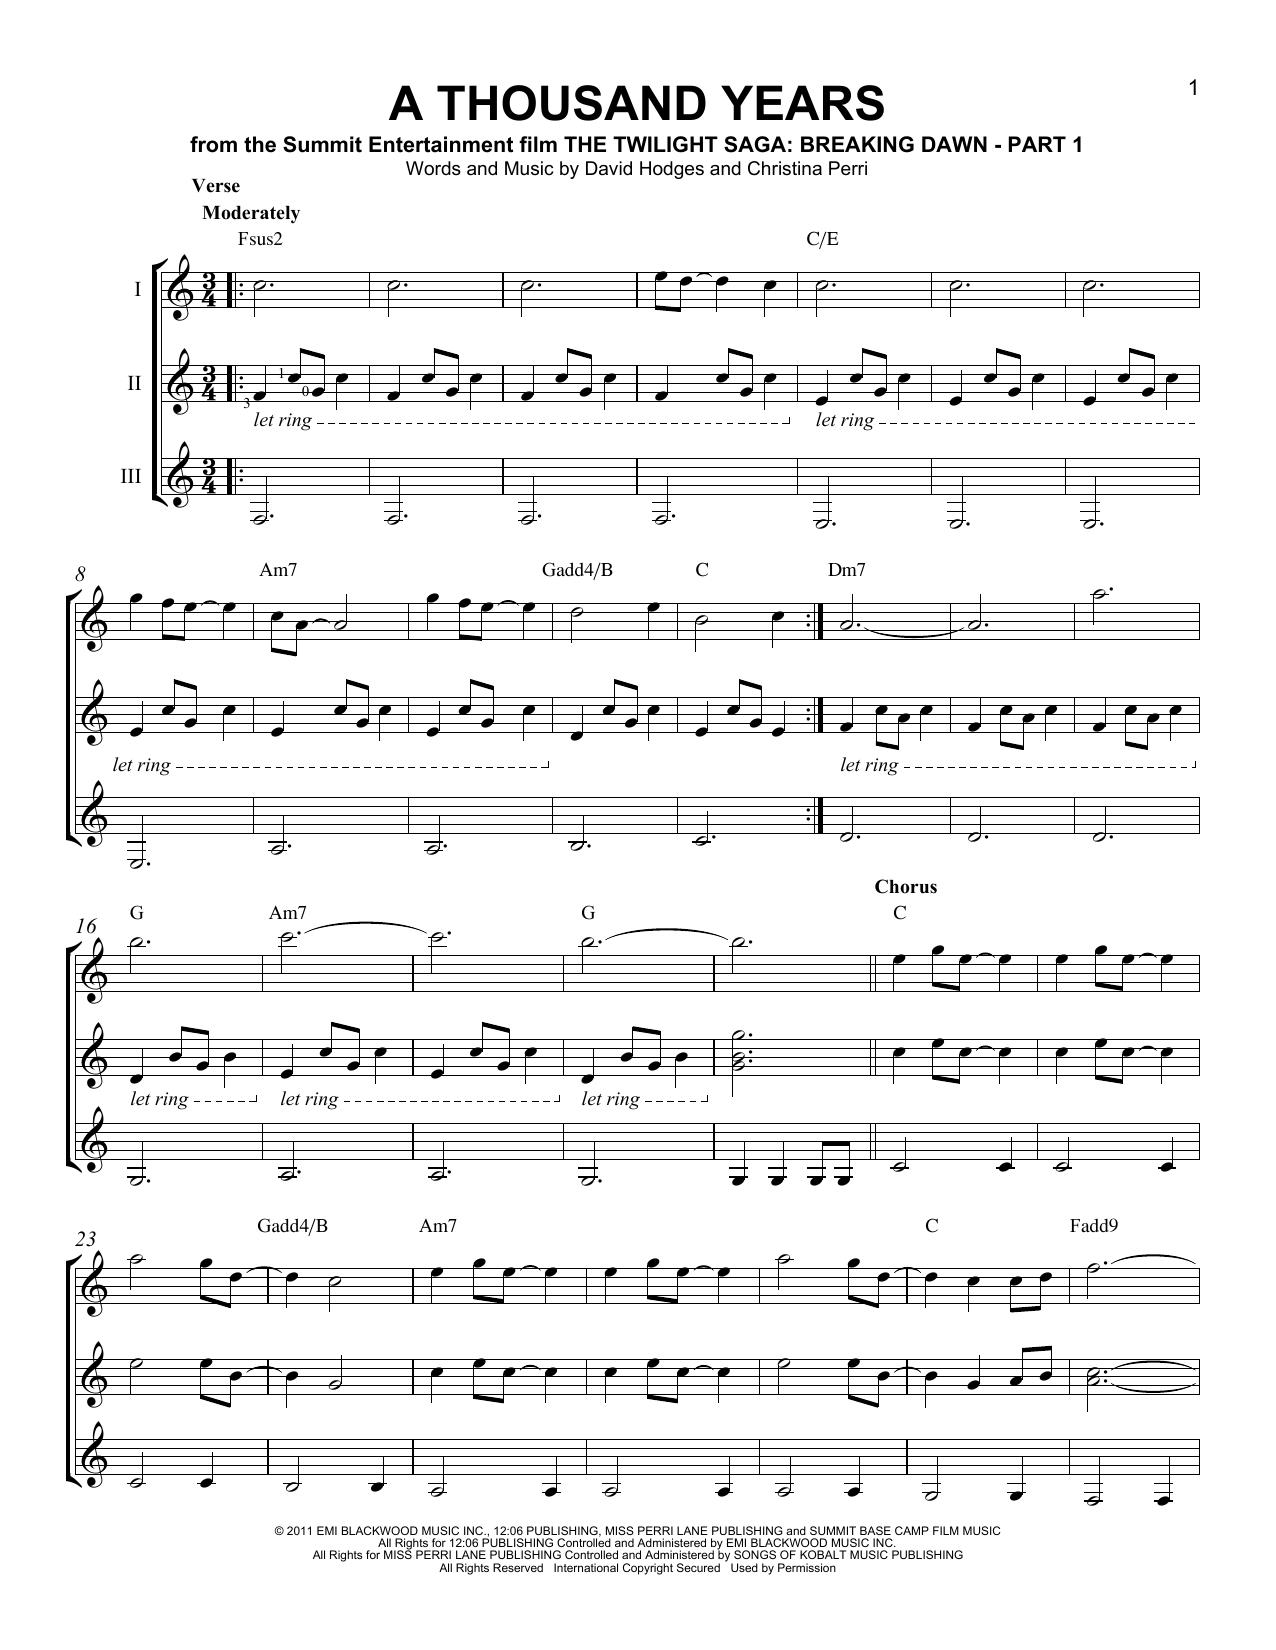 A Thousand Years Chords Christina Perri A Thousand Years Sheet Music Notes Chords Download Printable Guitar Ensemble Sku 165629